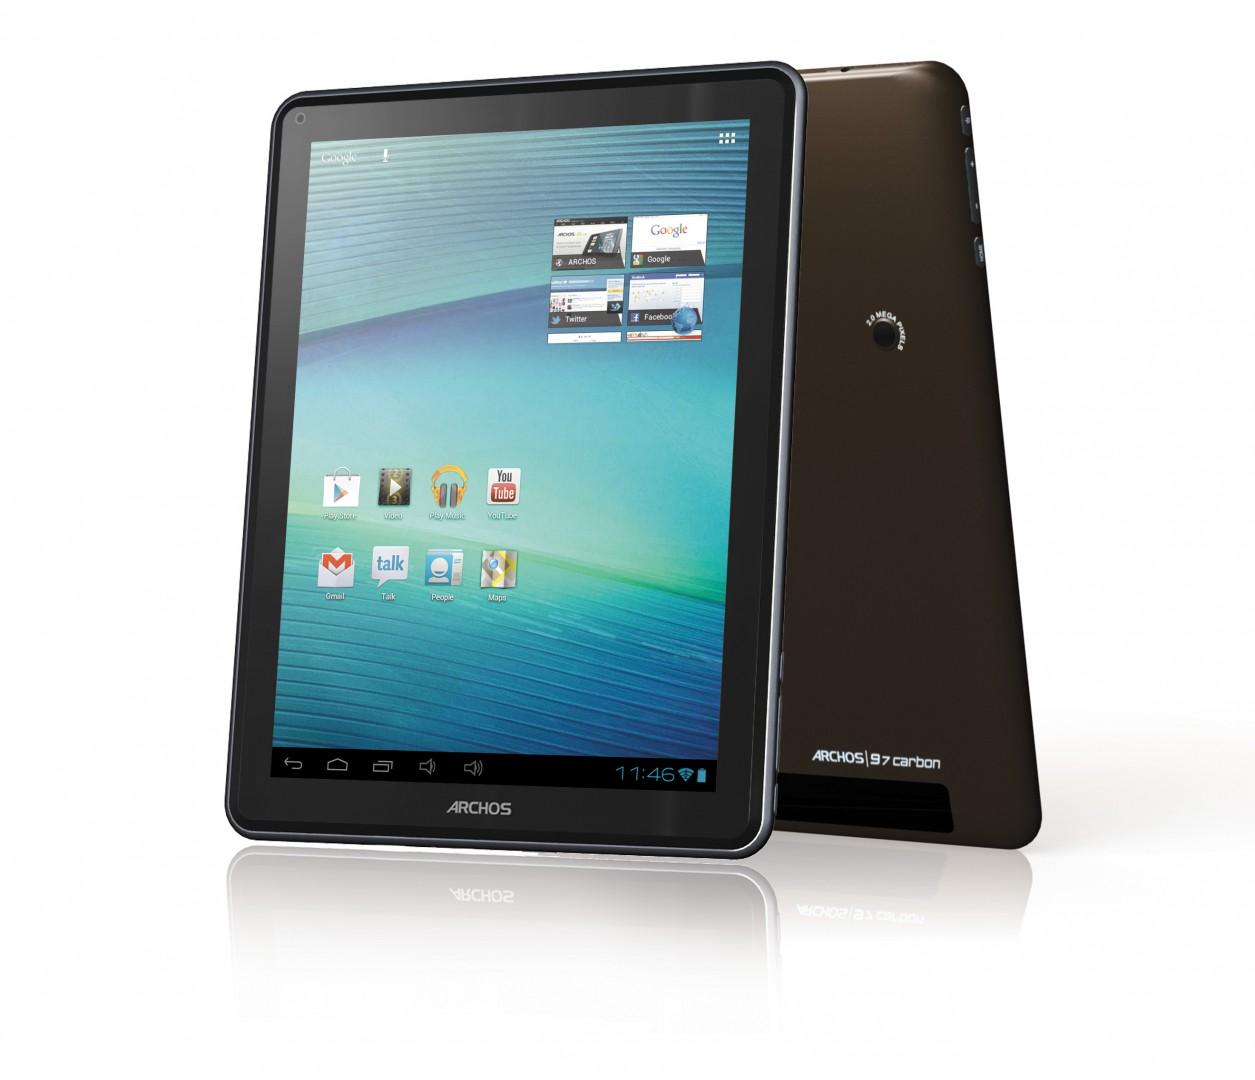 Archos 97 Carbon: Das erste der Elements-Tablets - Archos 97 Carbon - 9,7-Zoll-Tablet mit Android (Archos)